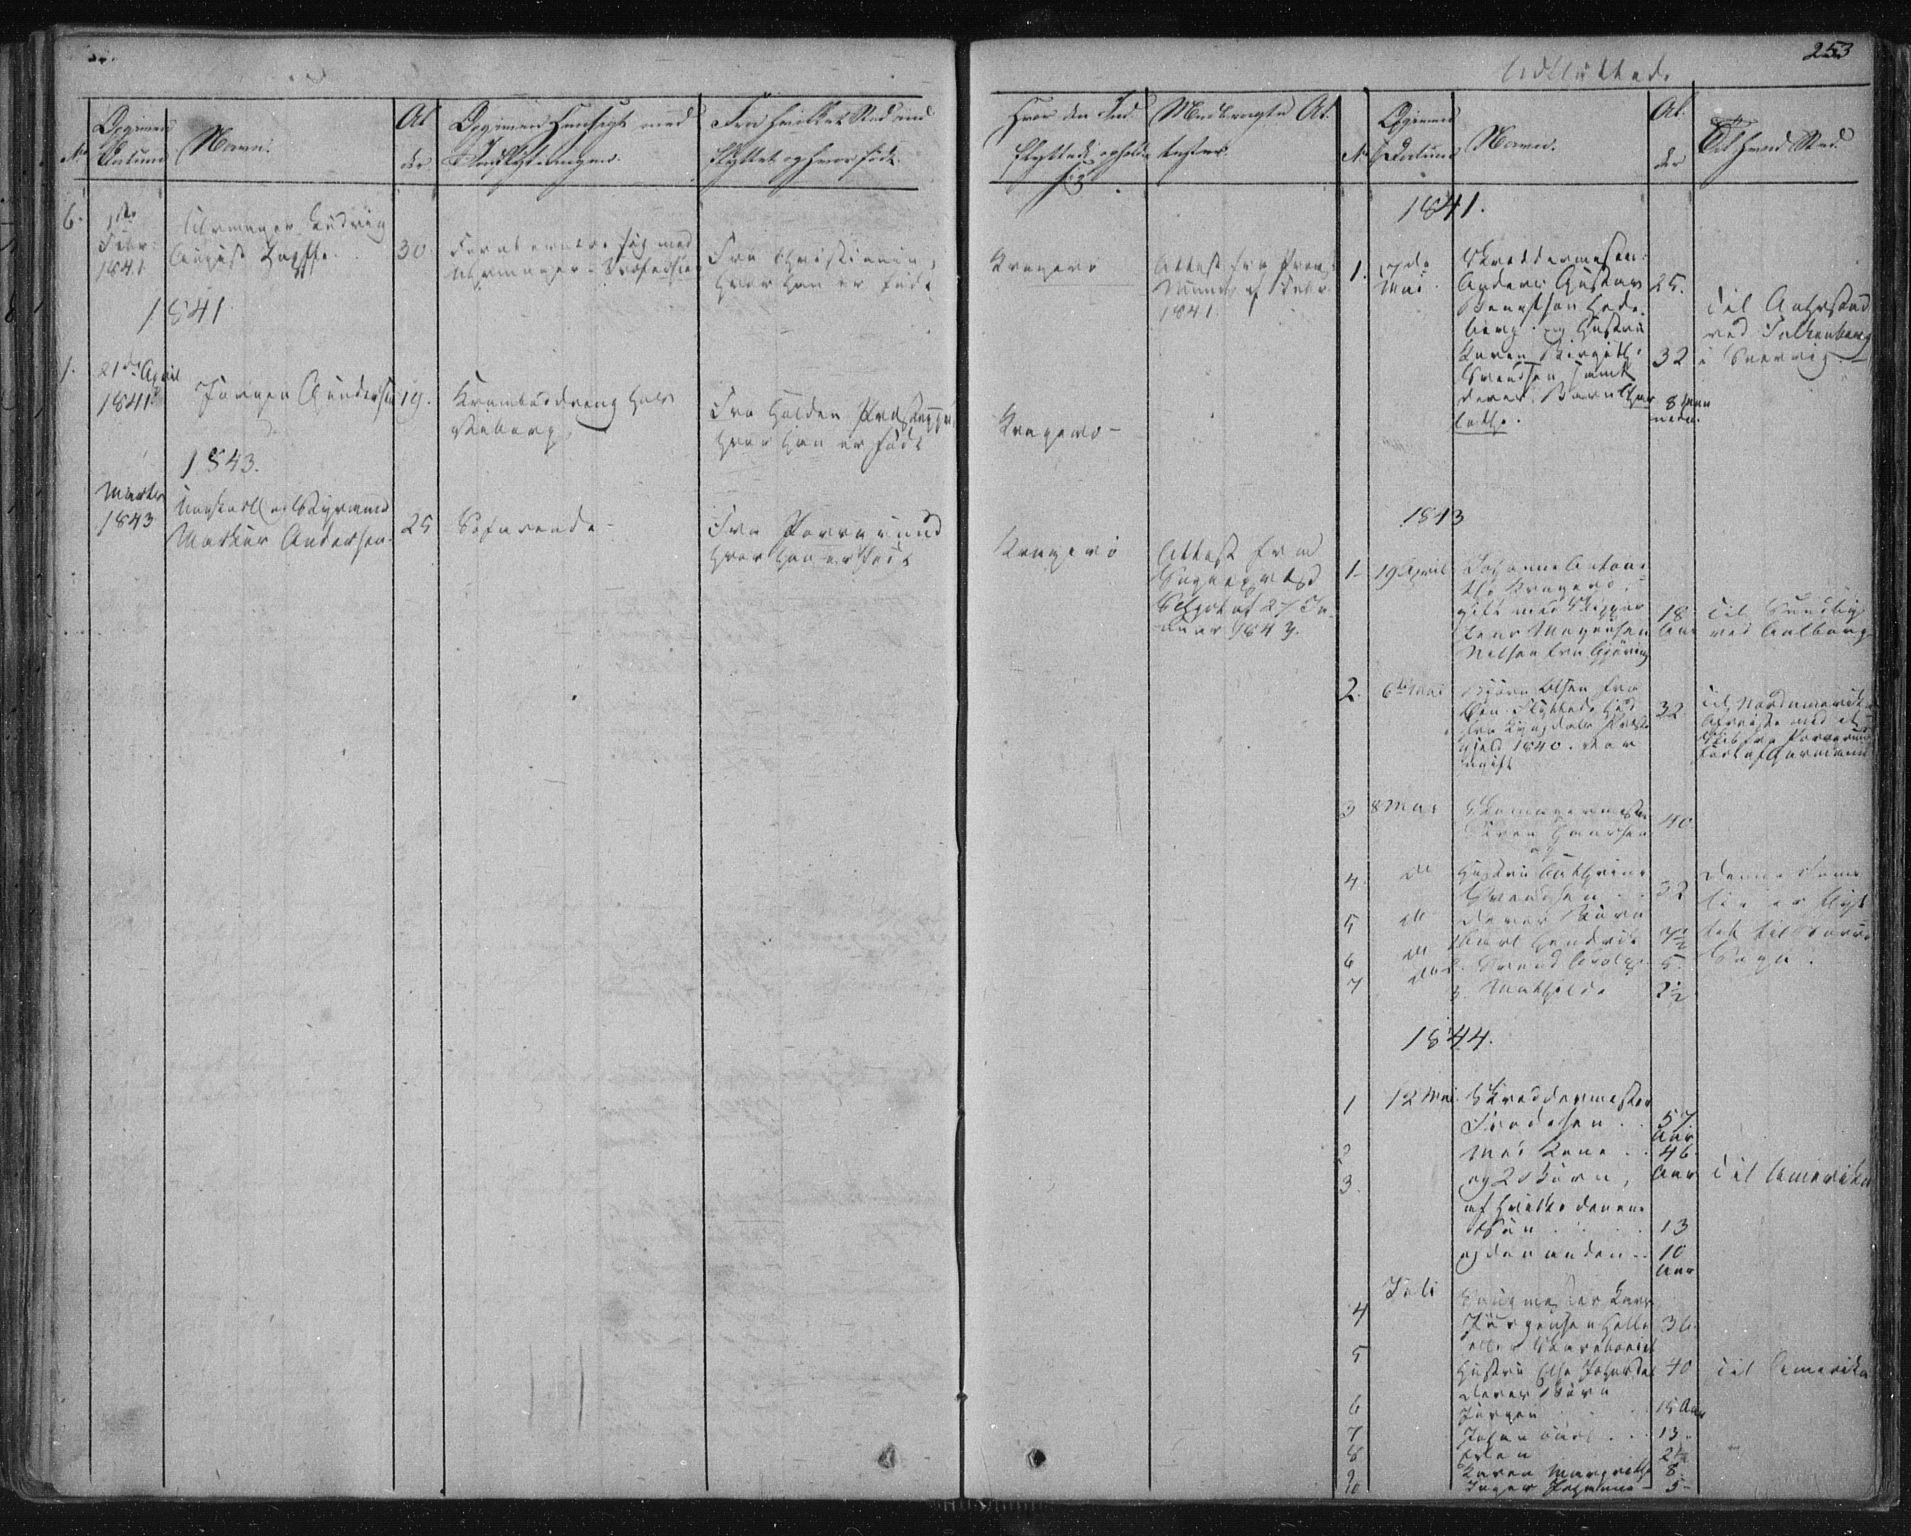 SAKO, Kragerø kirkebøker, F/Fa/L0005: Ministerialbok nr. 5, 1832-1847, s. 253